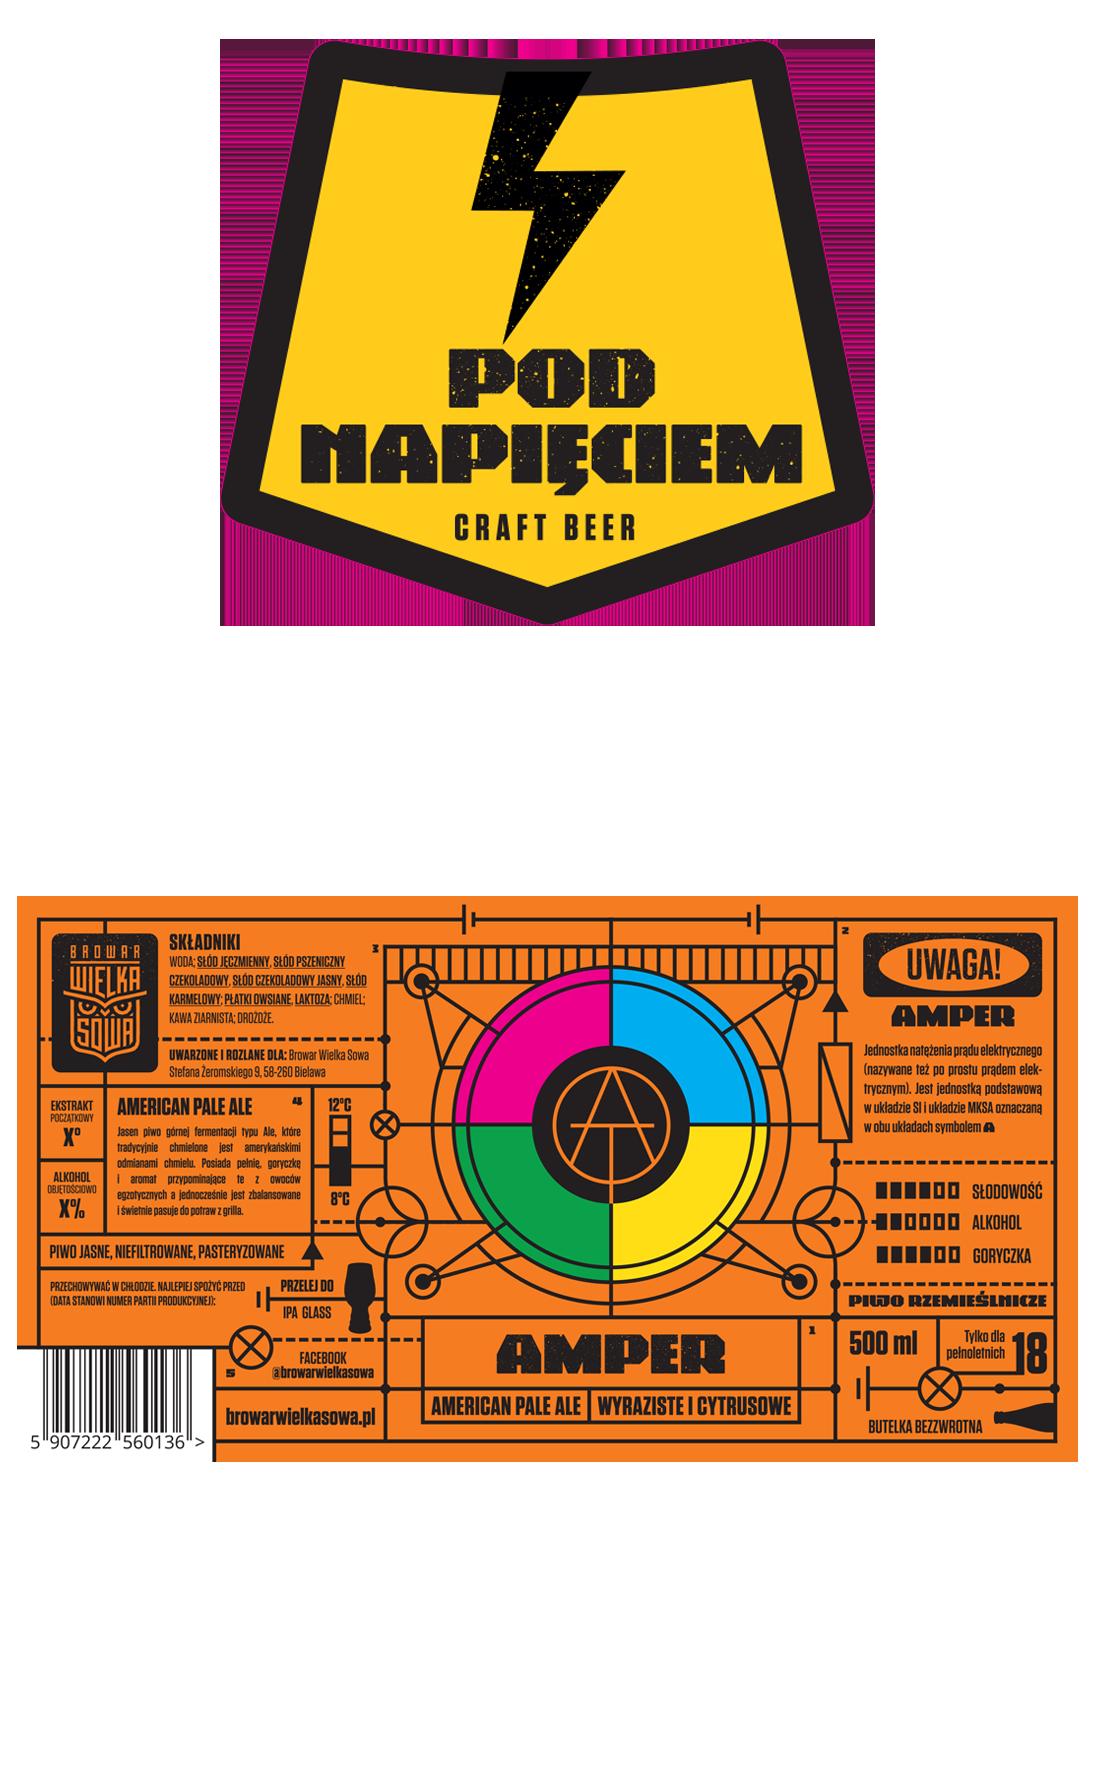 AMPER – American Pale Ale